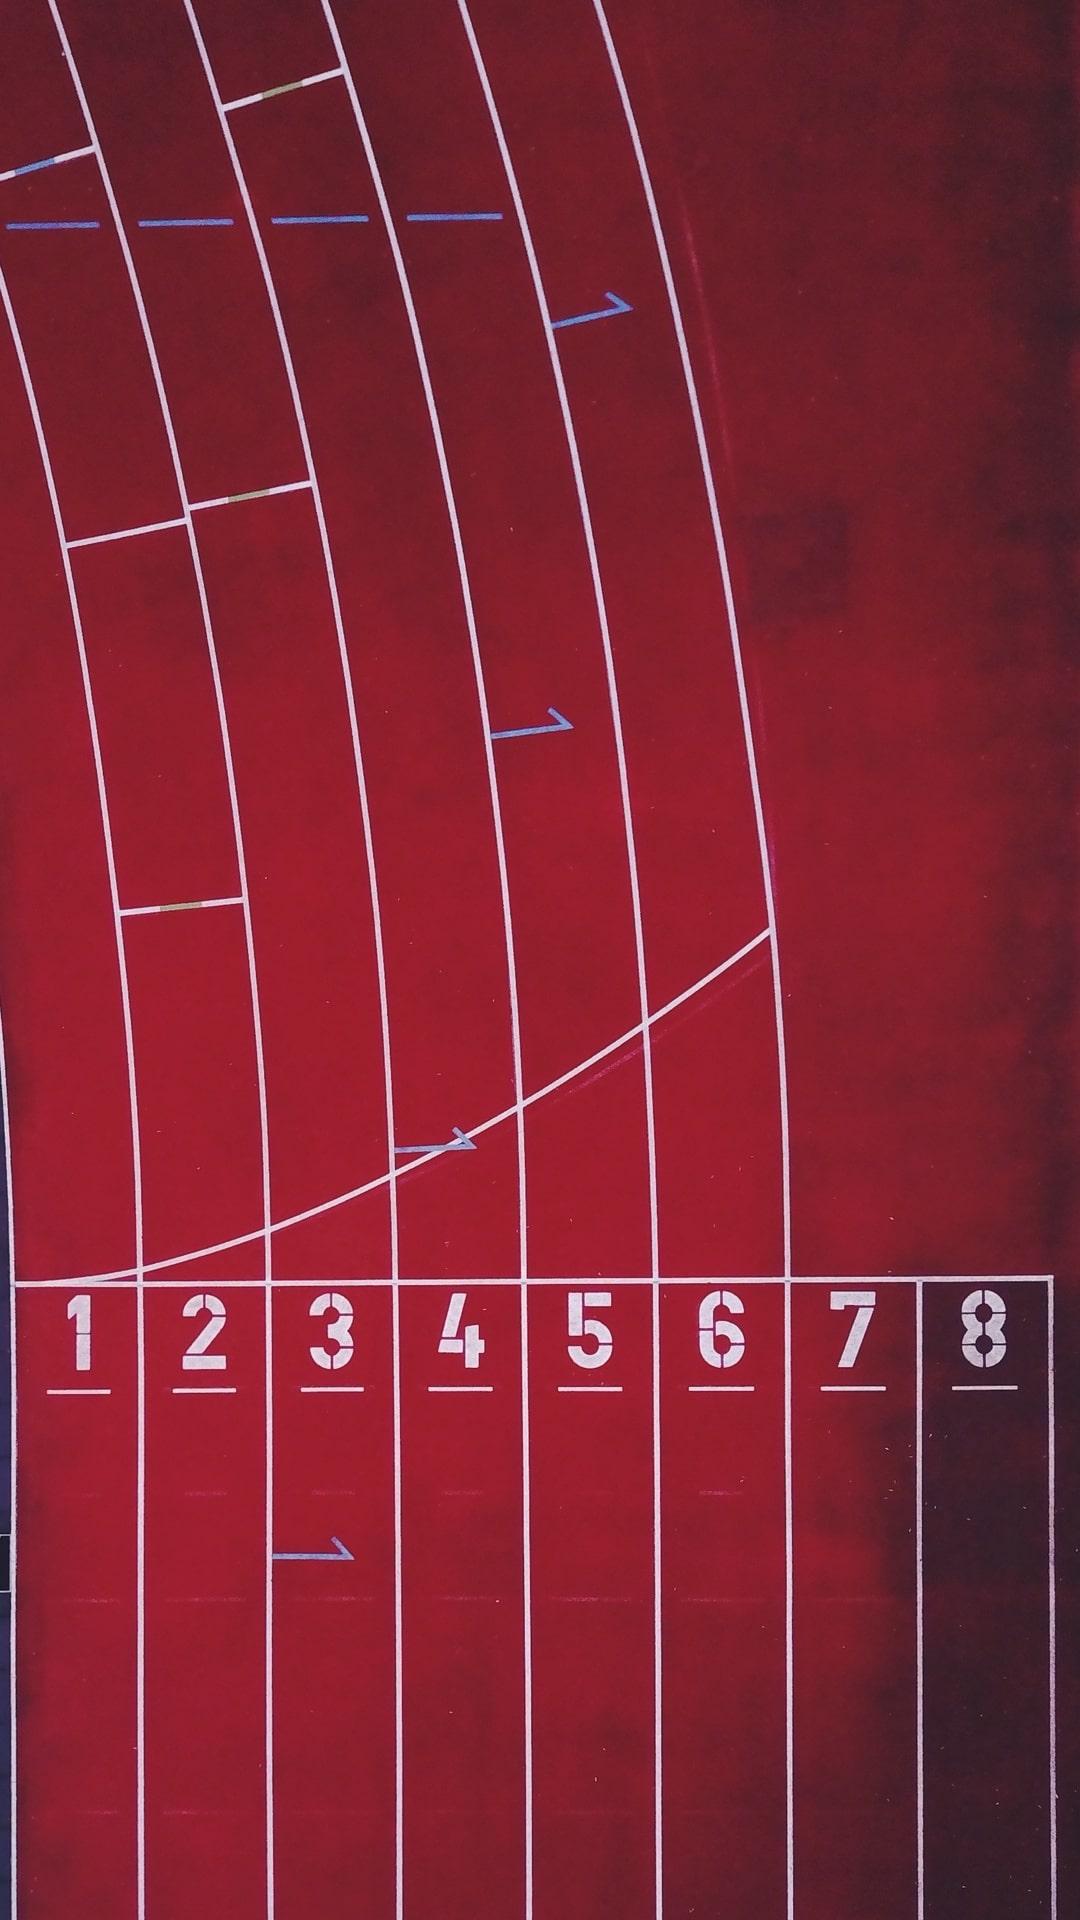 Racing Track Numbers